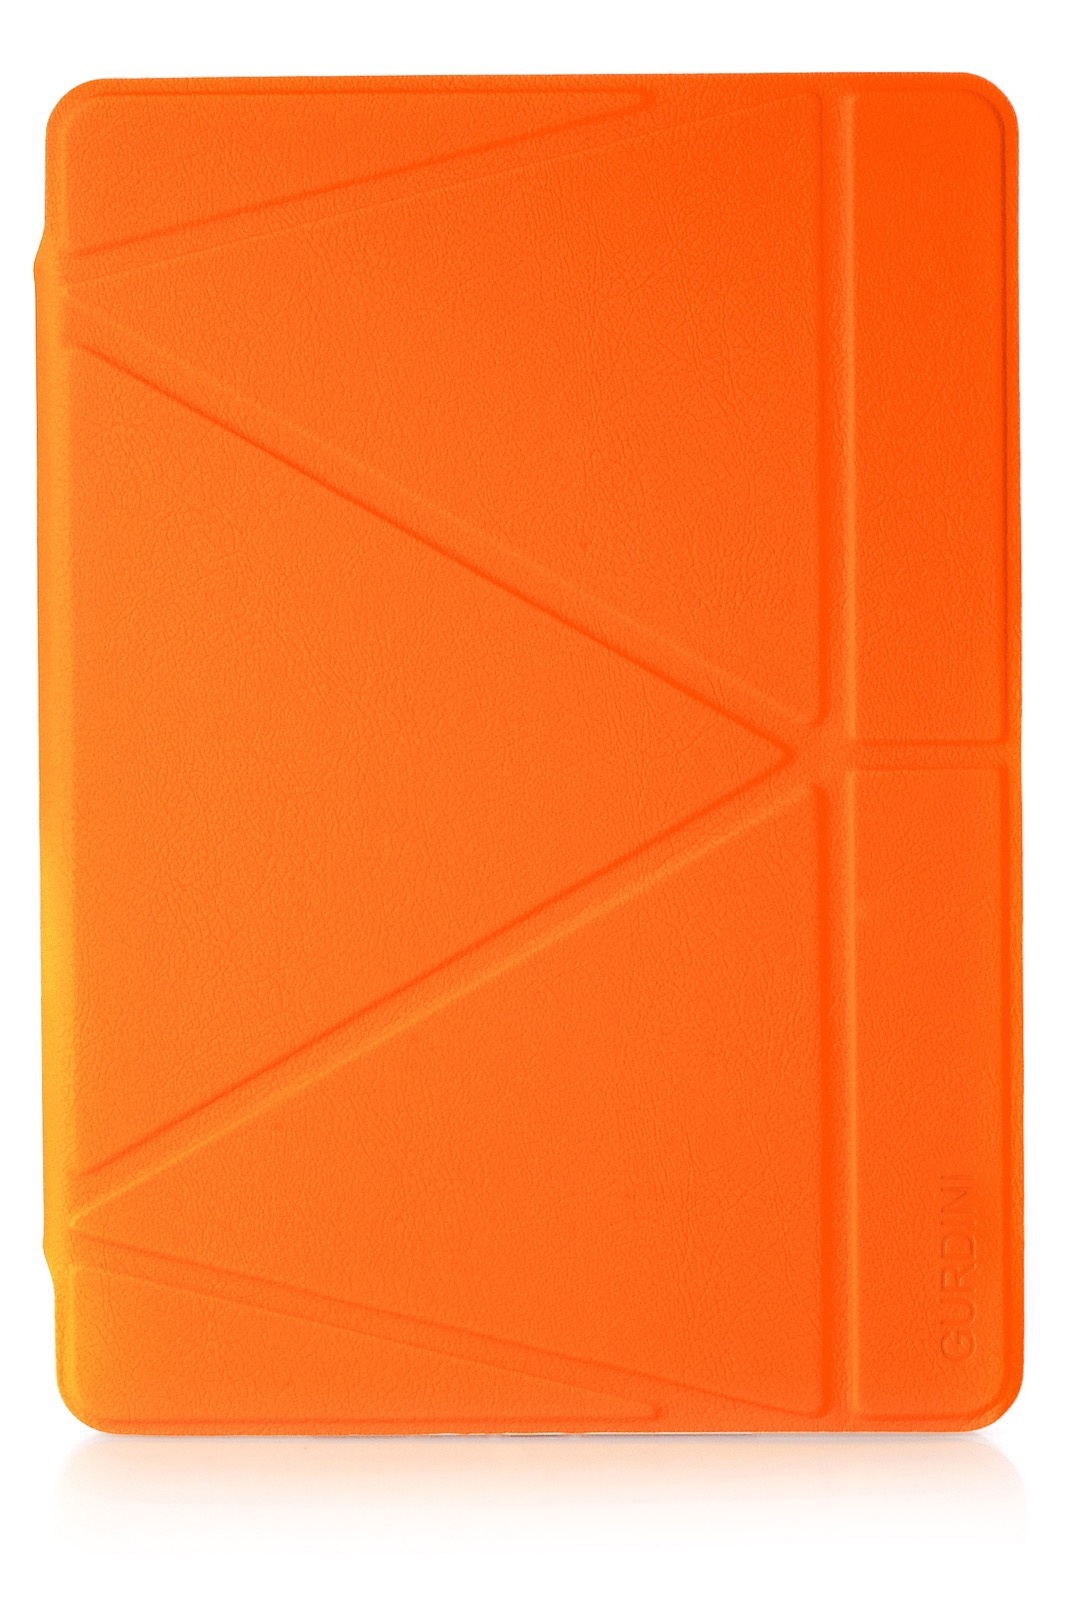 "Чехол для планшета Gurdini Lights Series для Apple iPad Pro 12.9"" 2016, 800023, оранжевый"